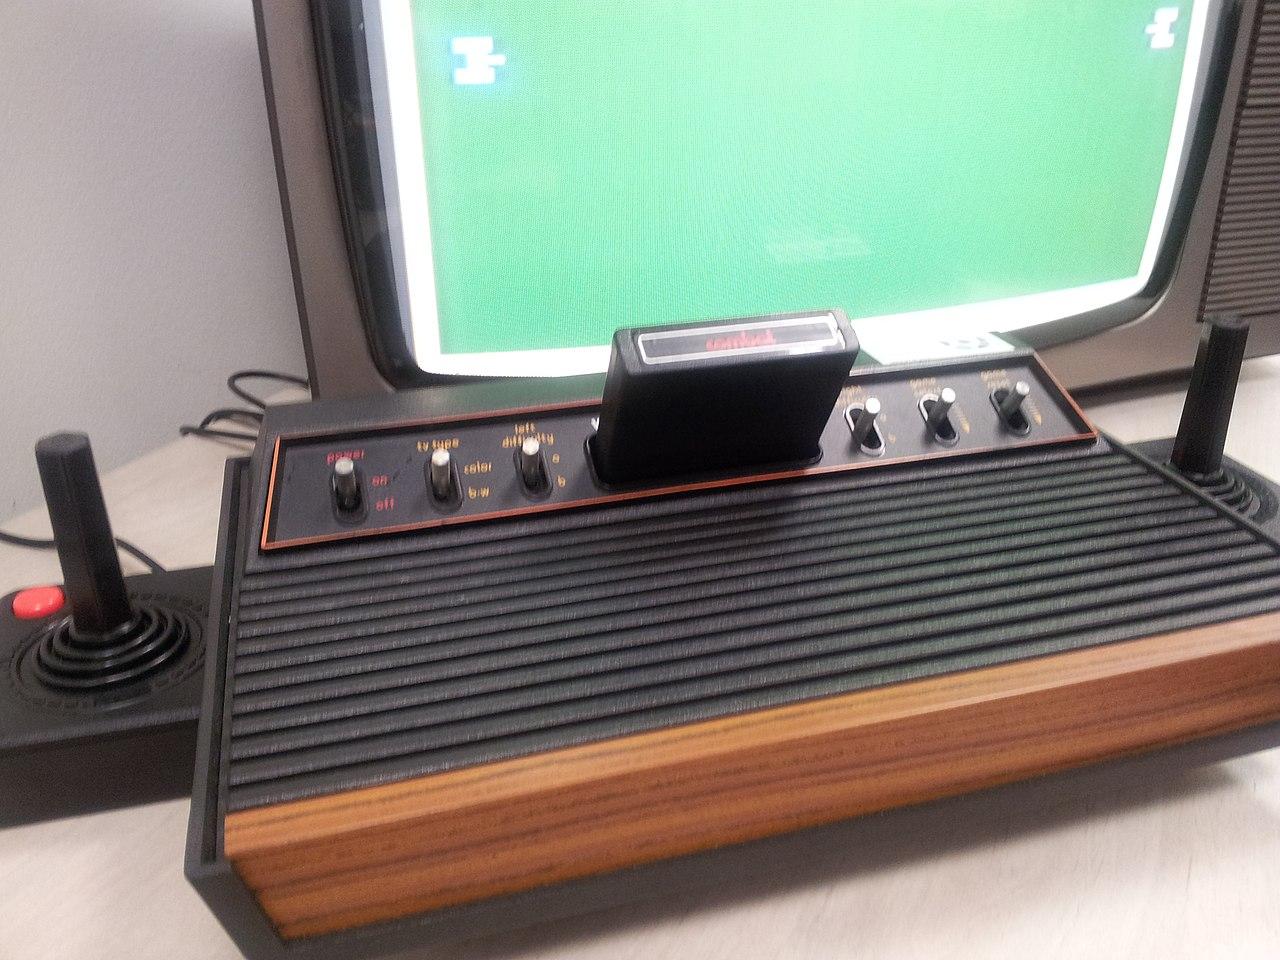 Original file 3 264 2 448 pixels file size mb mime type image jpeg - Original atari game console ...